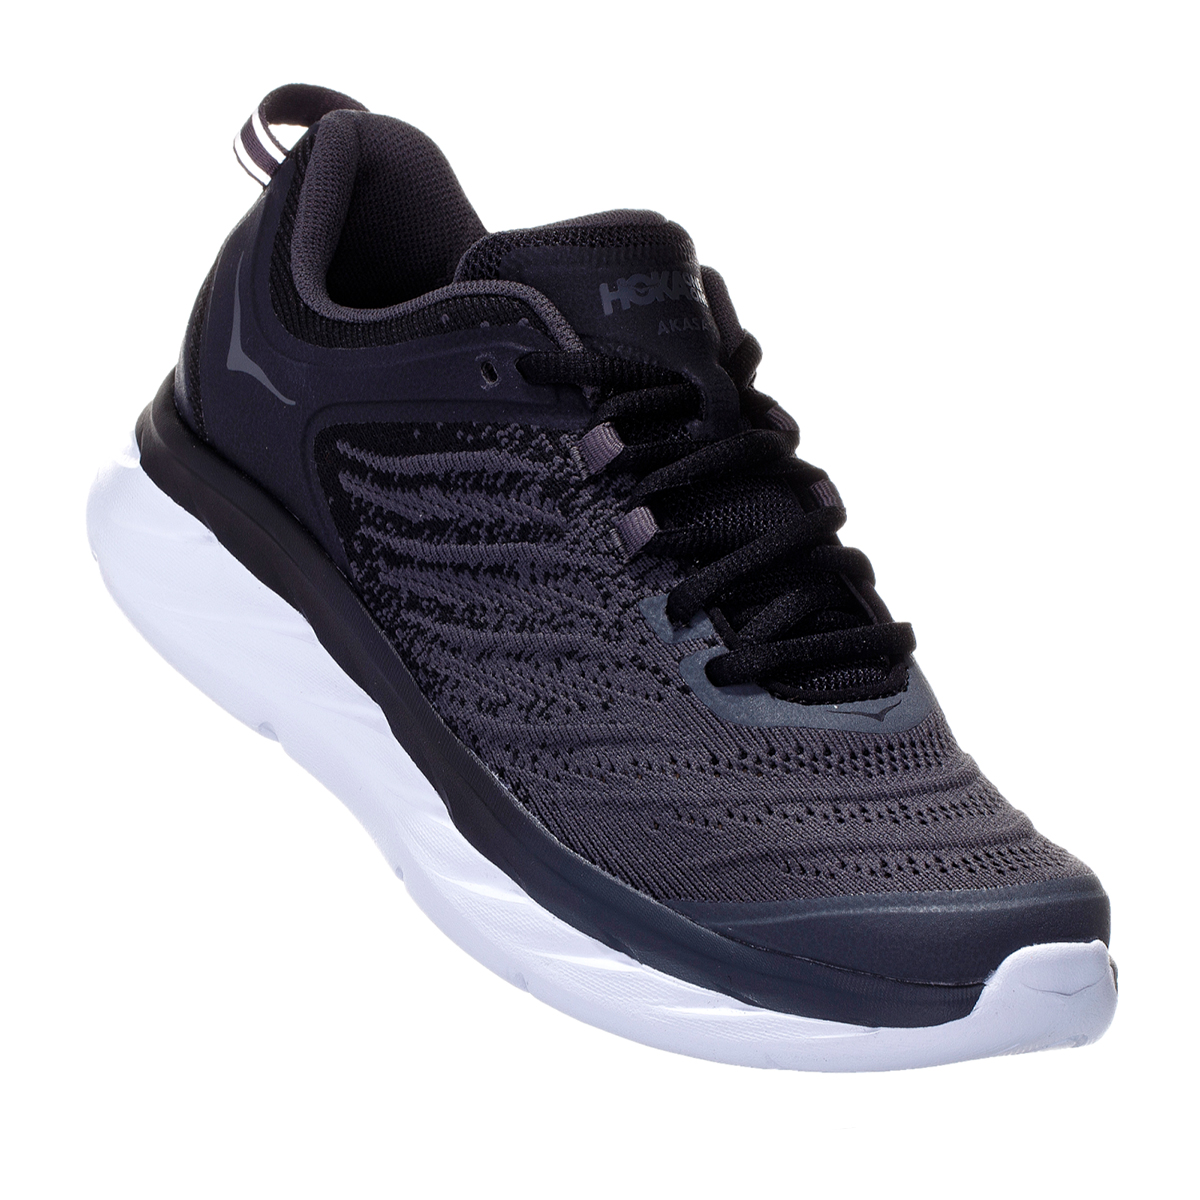 Men's Hoka One One Akasa Running Shoe - Color: Black/Dark Shadow - Size: 7 - Width: Regular, Black/Dark Shadow, large, image 5